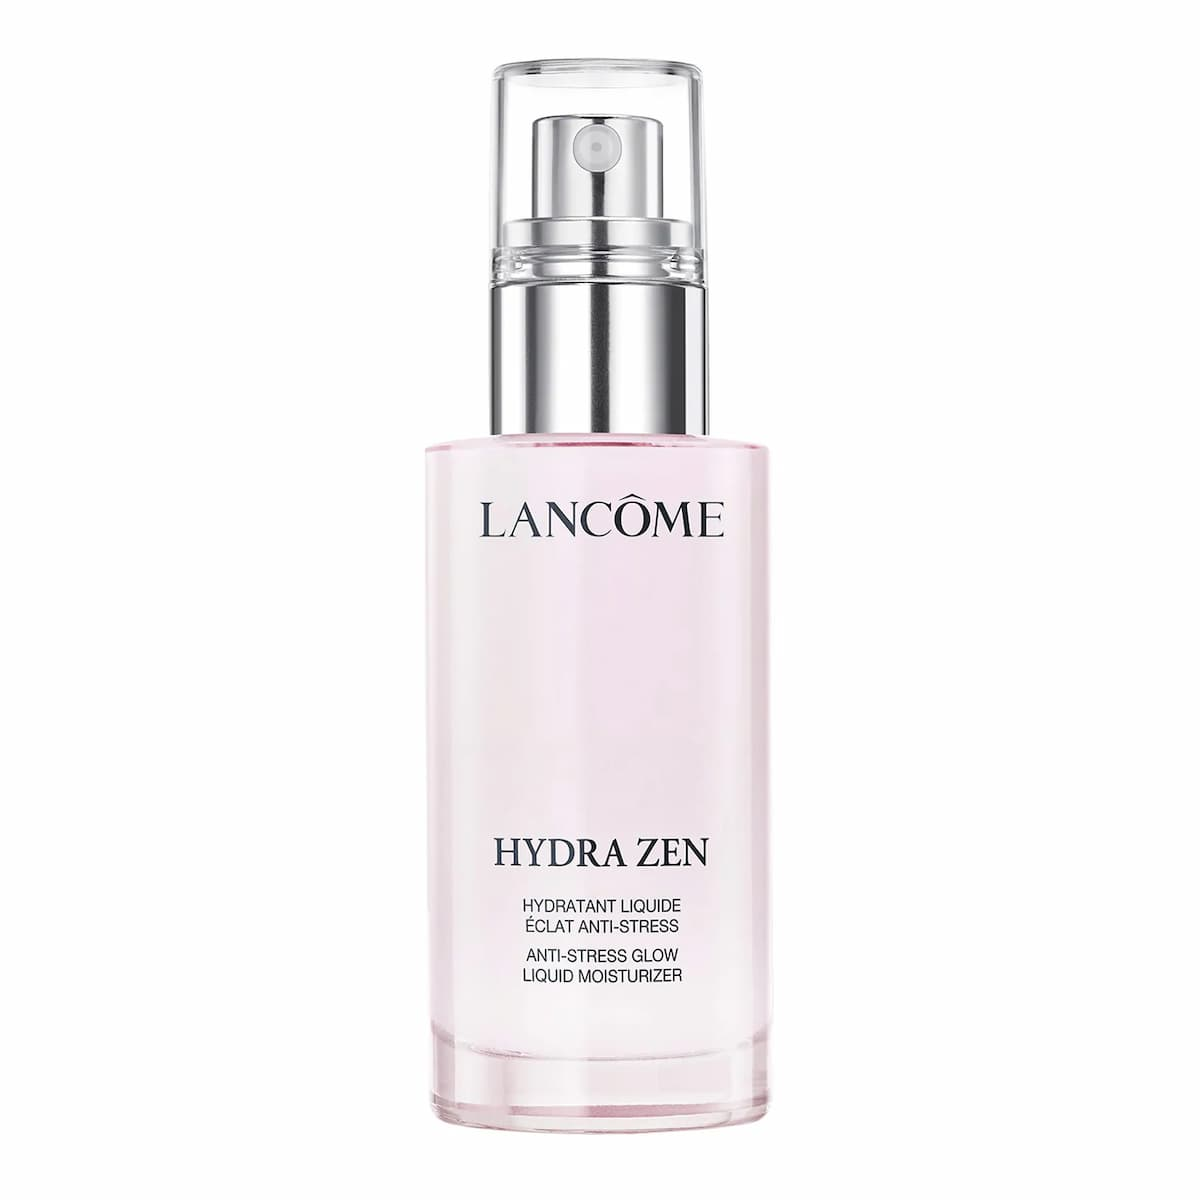 Lancôme - Hydra Zen - Hydratant liquide éclat anti-stress 50 ml